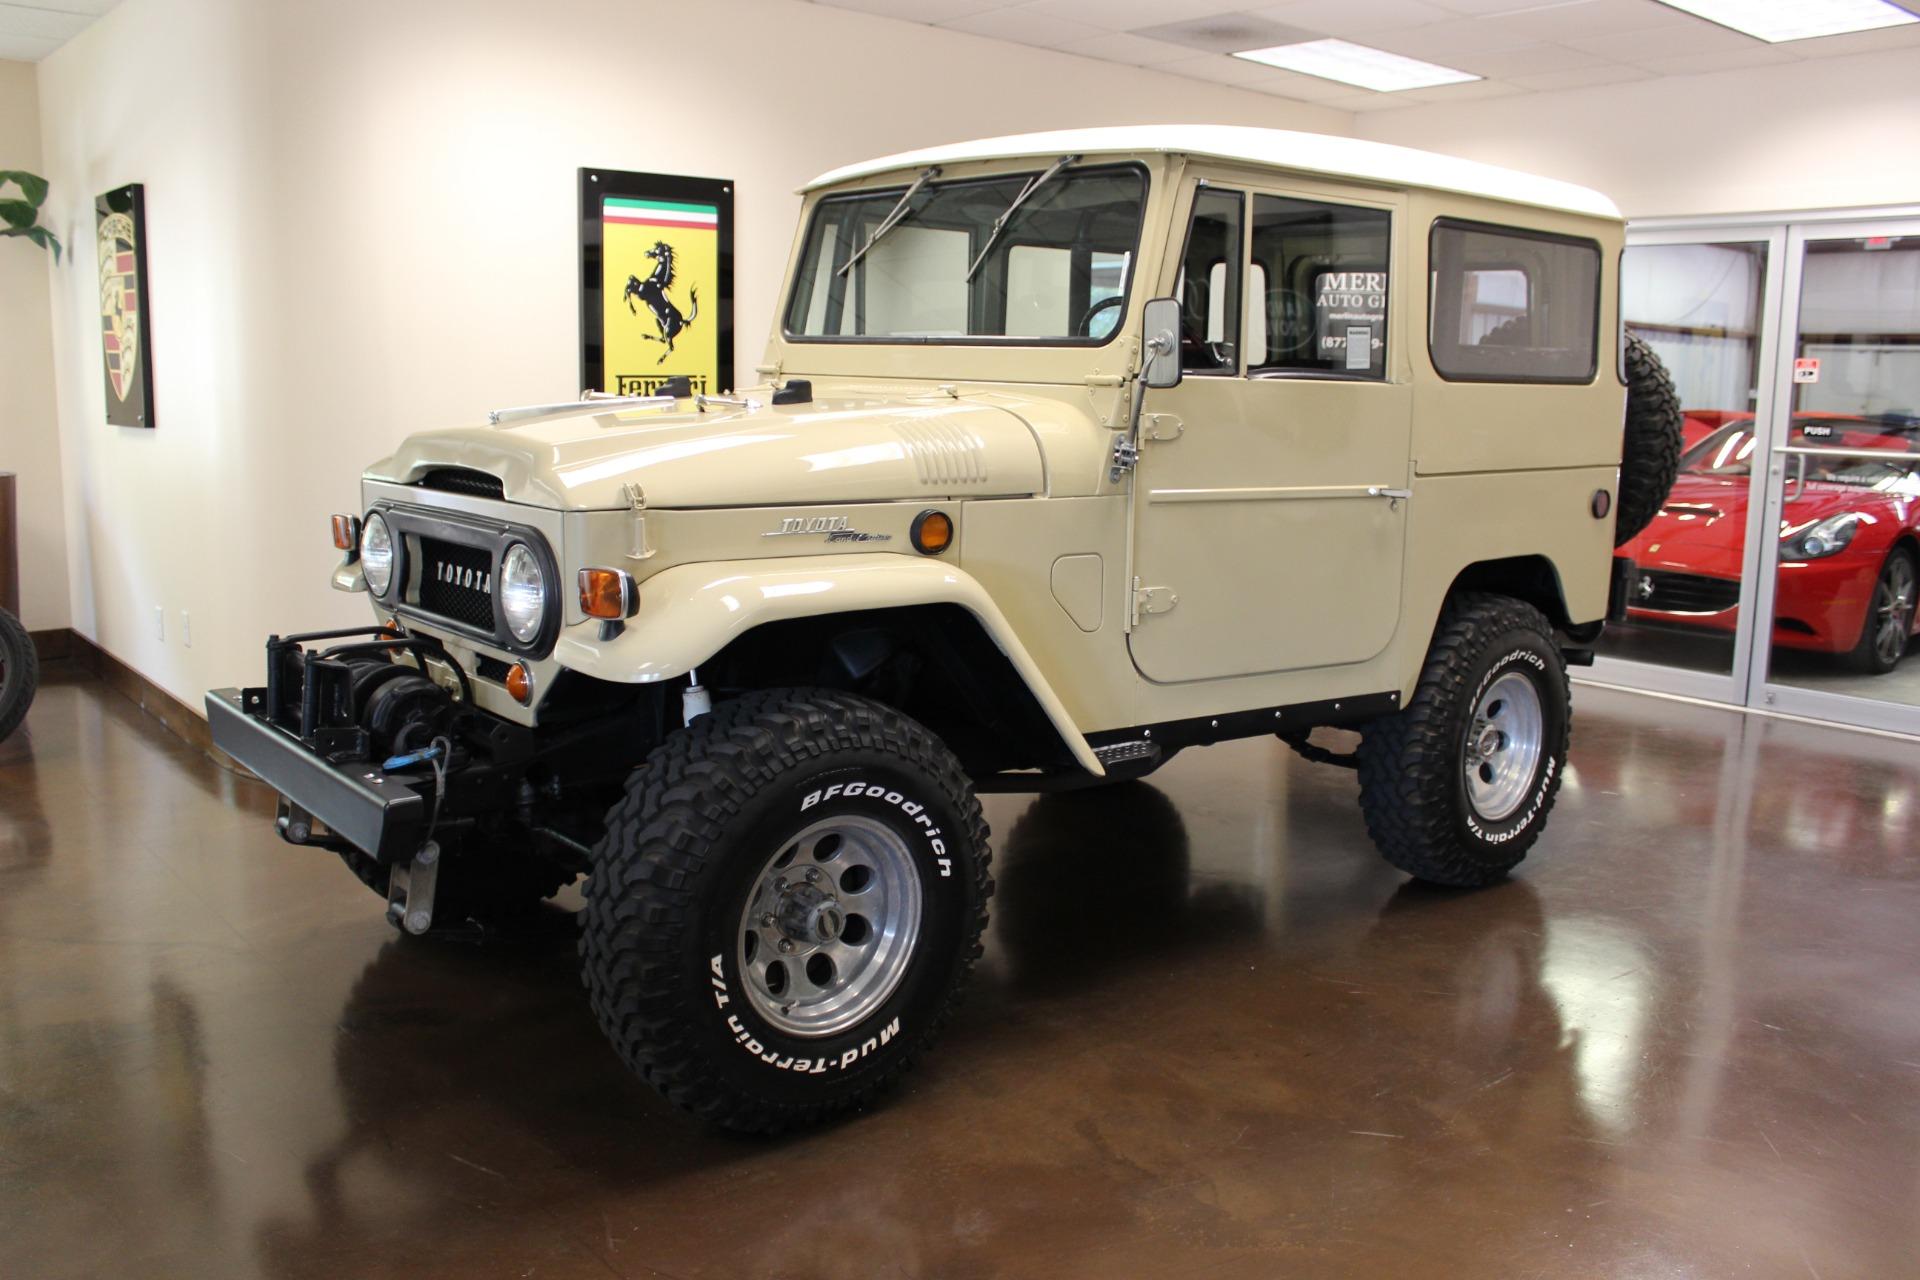 used 1969 toyota fj40 cruiser toyota beige manual lifted bf goodrichused 1969 toyota fj40 cruiser toyota beige manual lifted bf goodrich restored